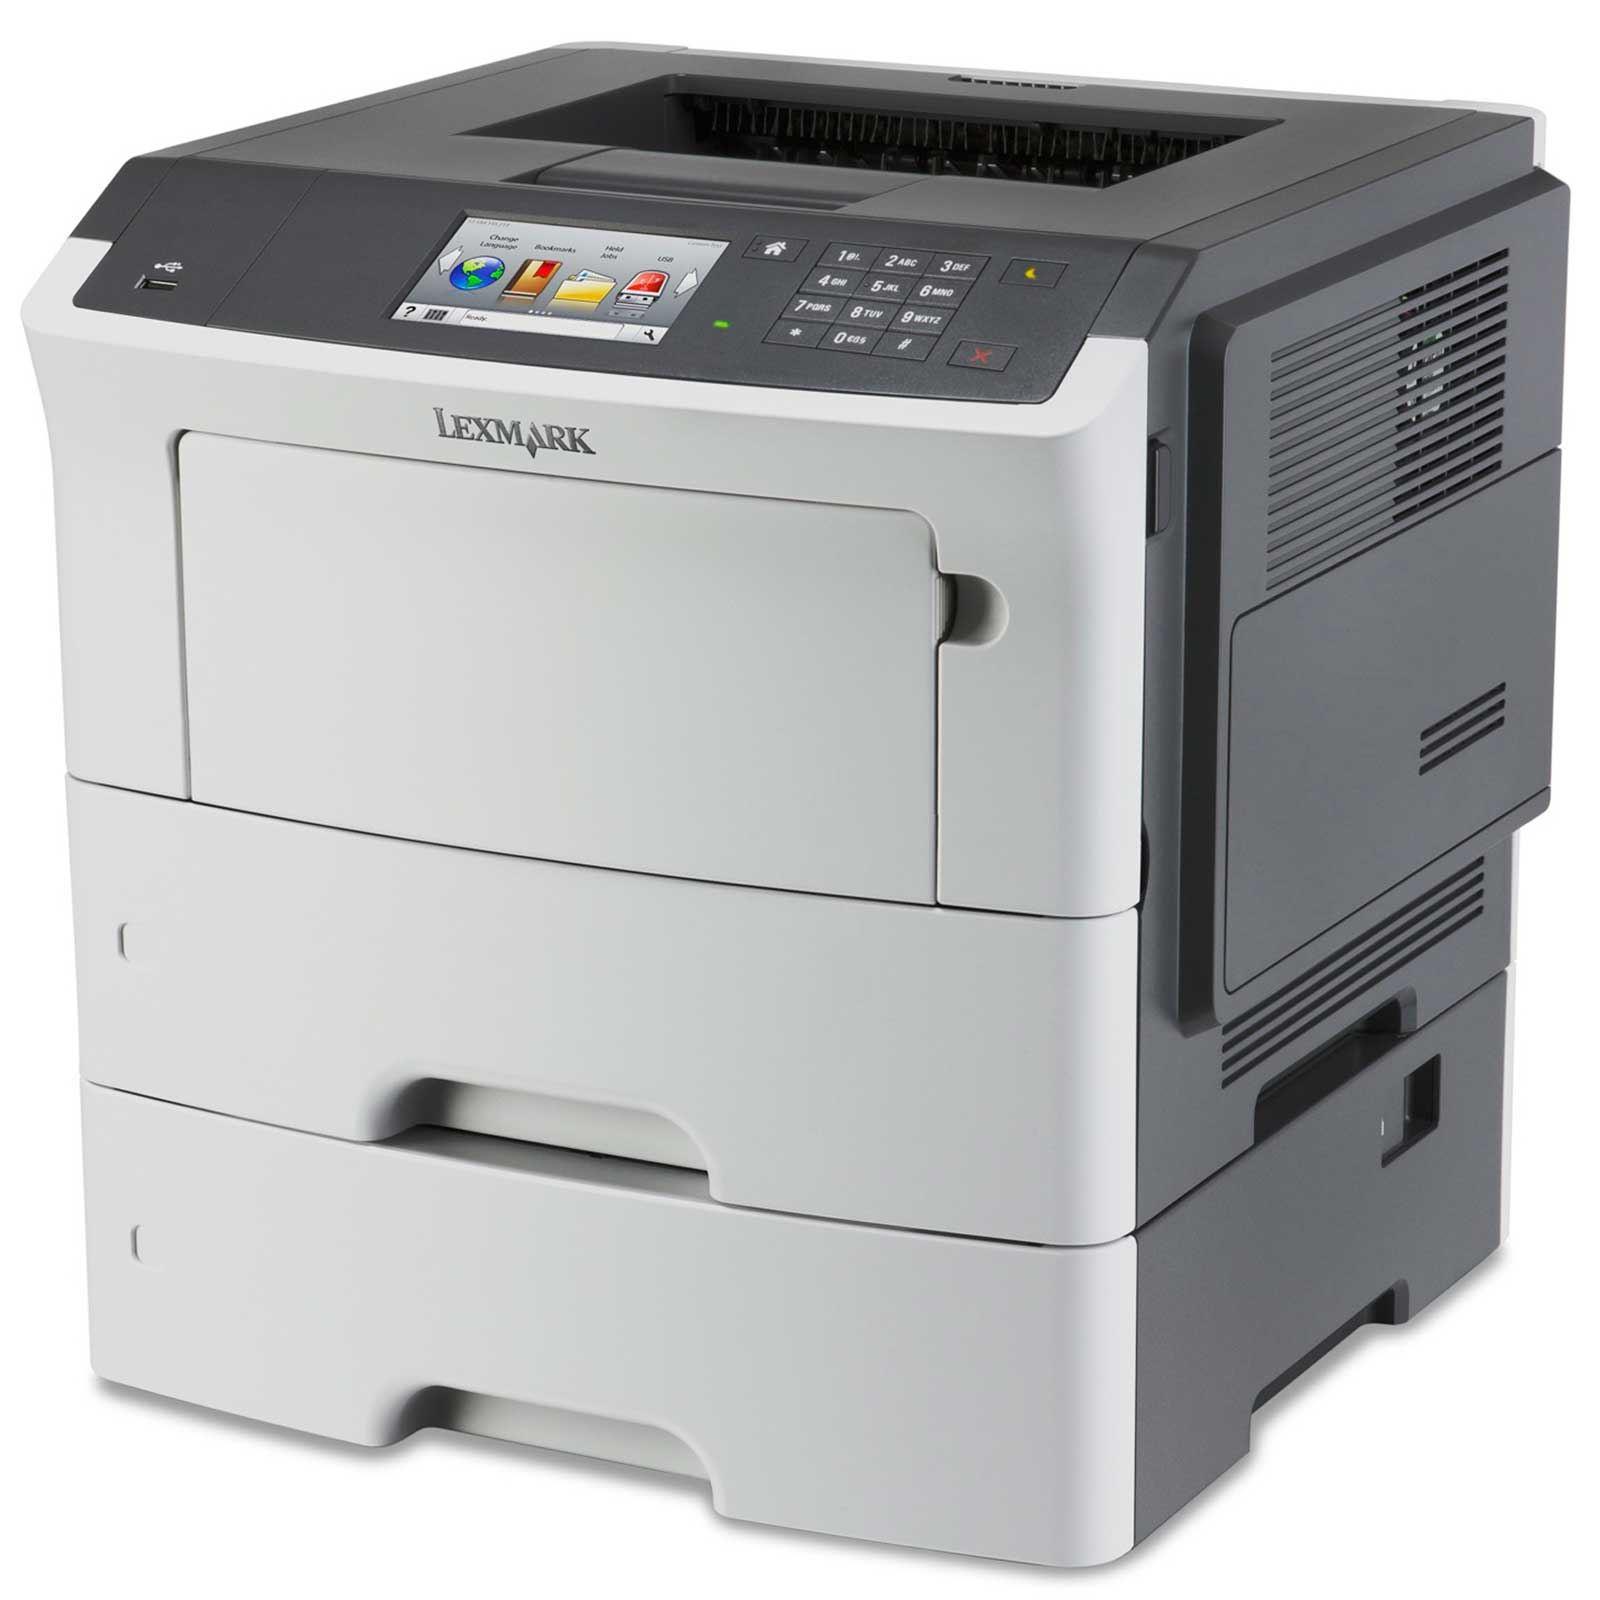 Lexmark MX511 Printer Universal PCL5e Update